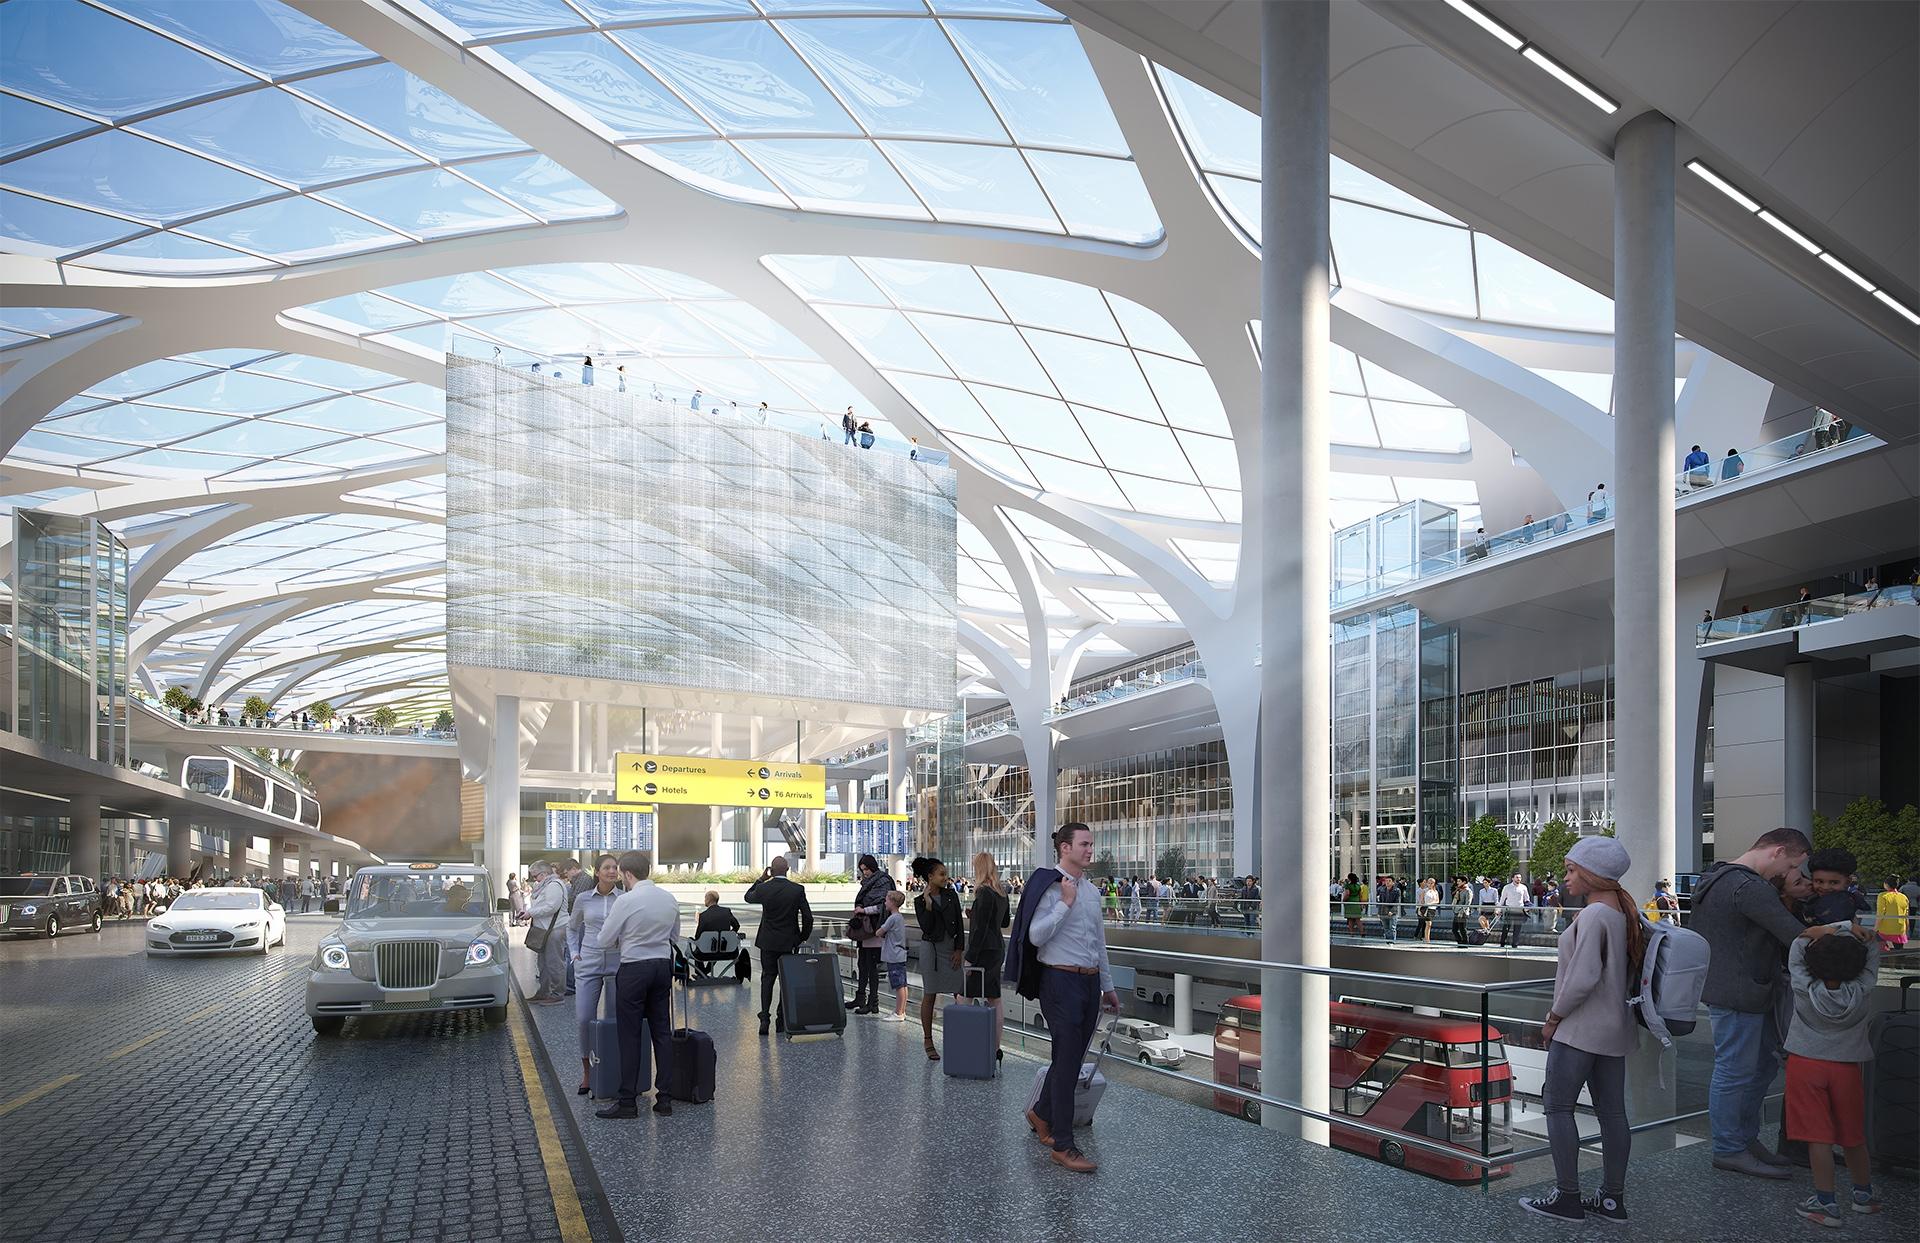 Heathrow West Features 3